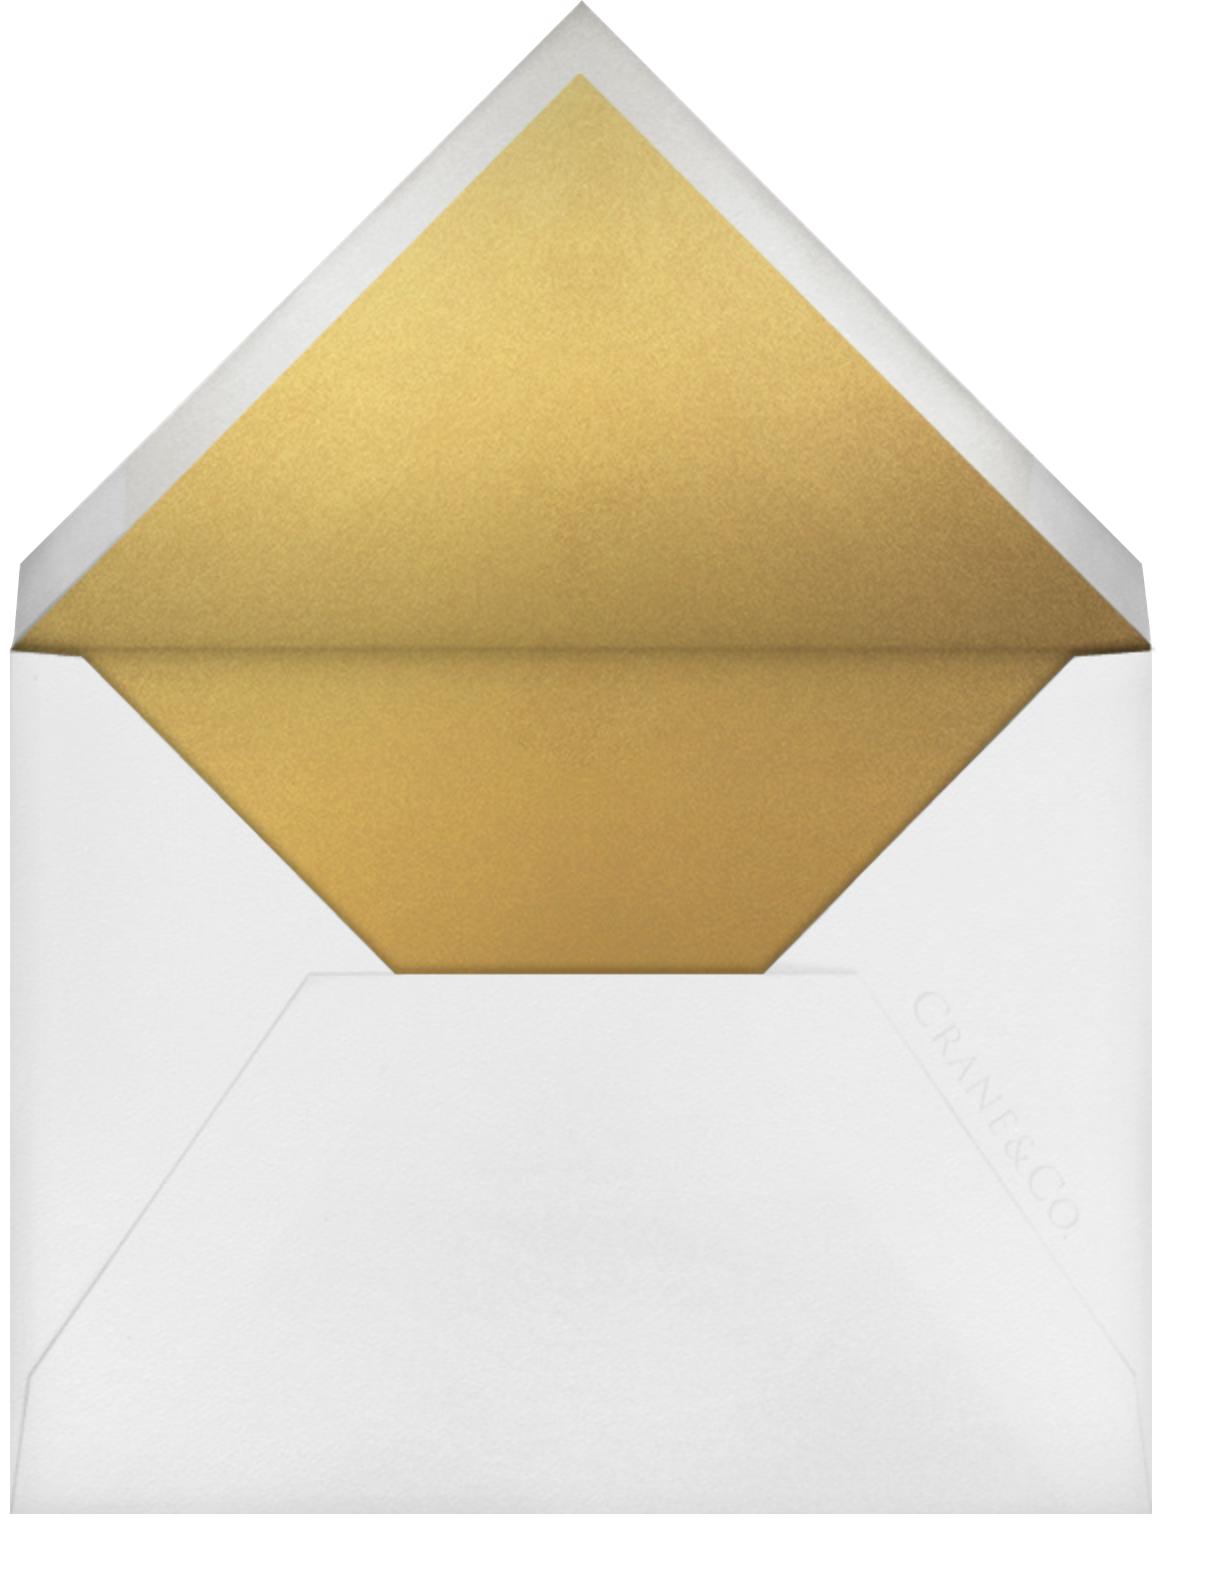 Miller (Thank You) - Medium Gold - Crane & Co. - Personalized stationery - envelope back